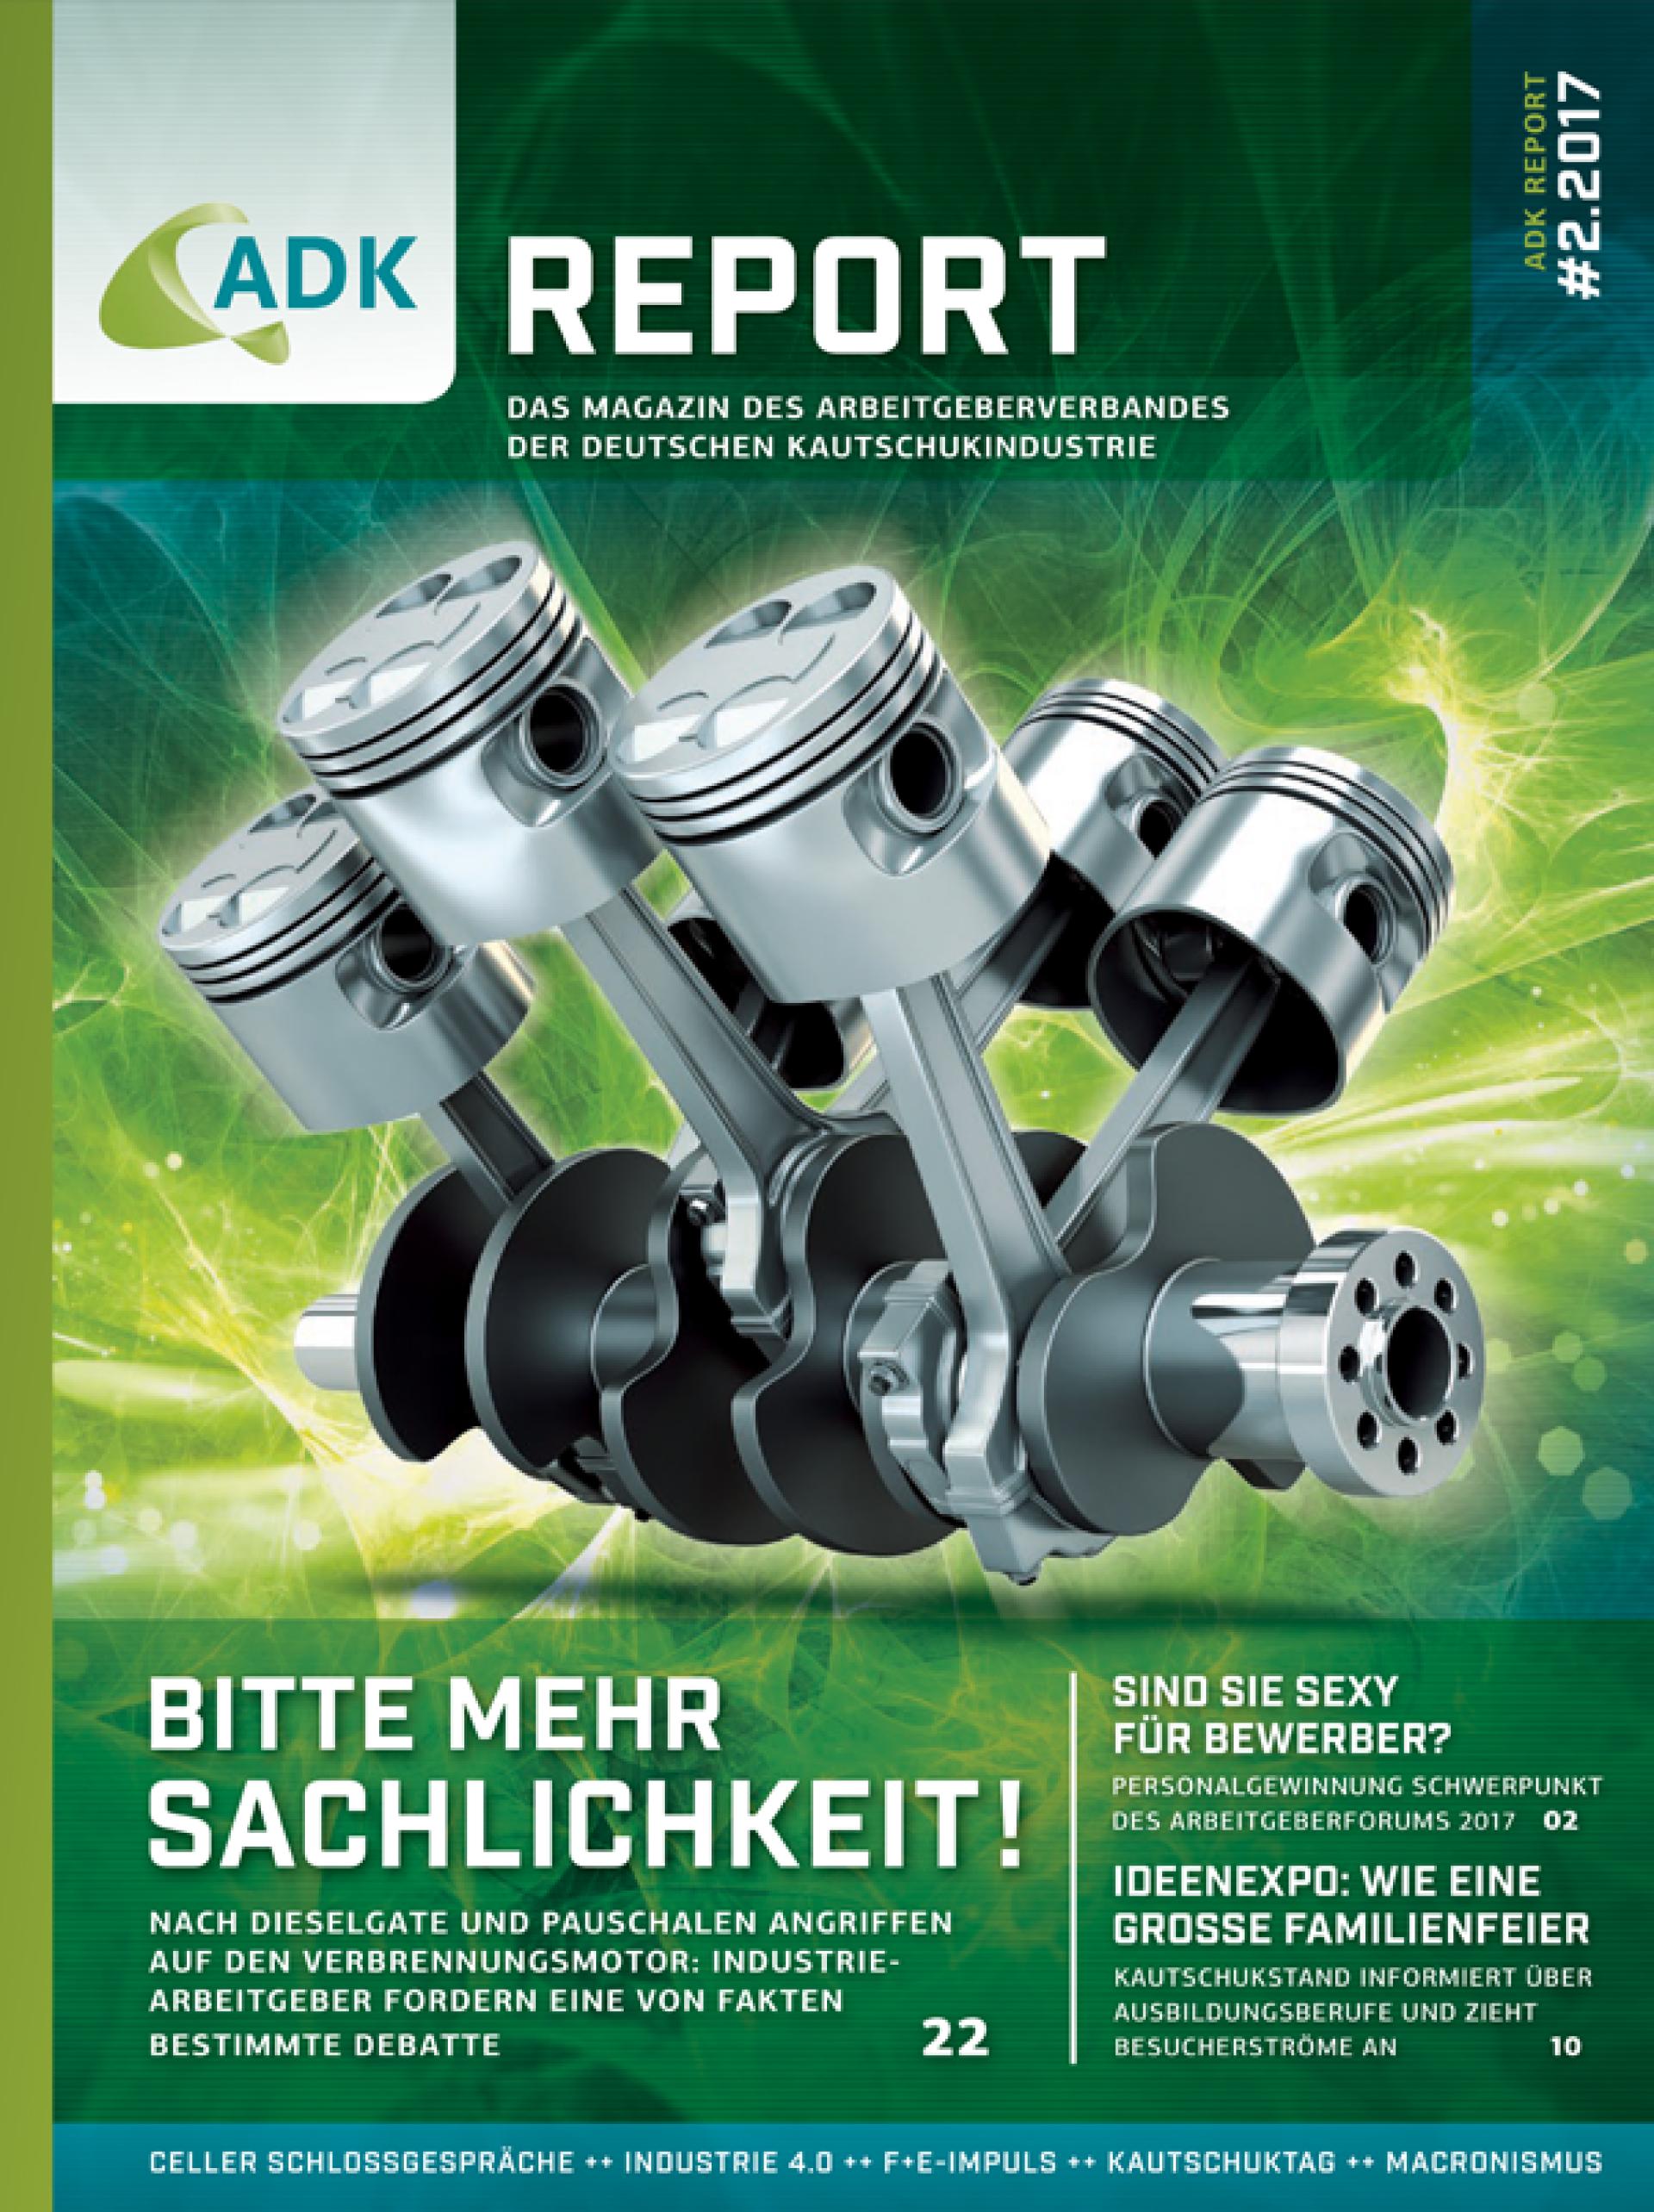 ADK Report 02/17 Titelseite